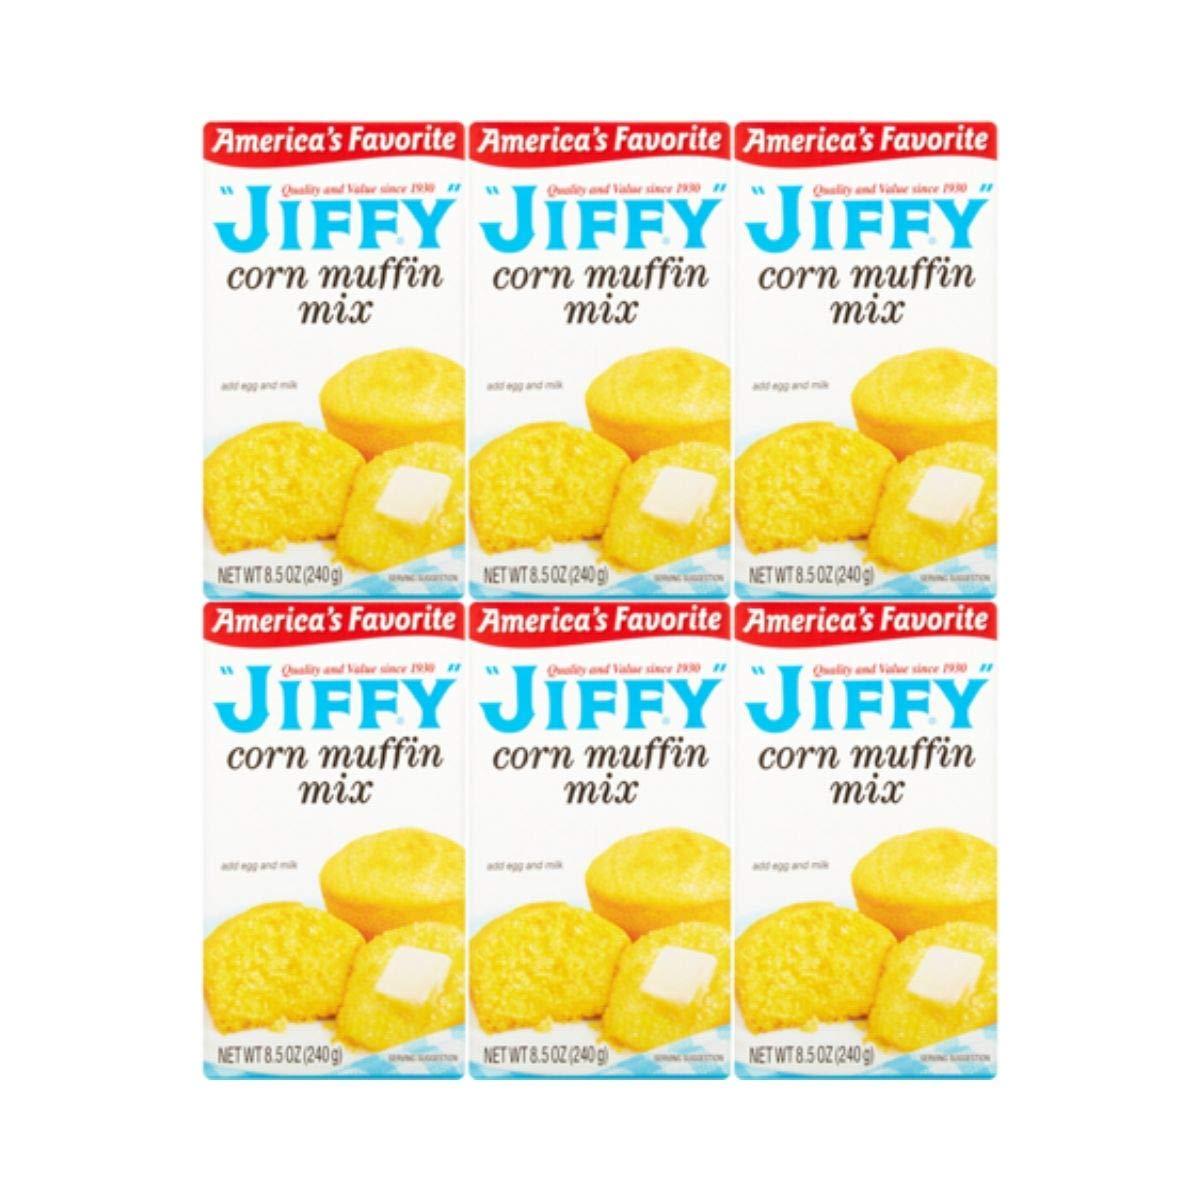 Jiffy Corn Muffin Mix, 8.5 oz, (6 Boxes)